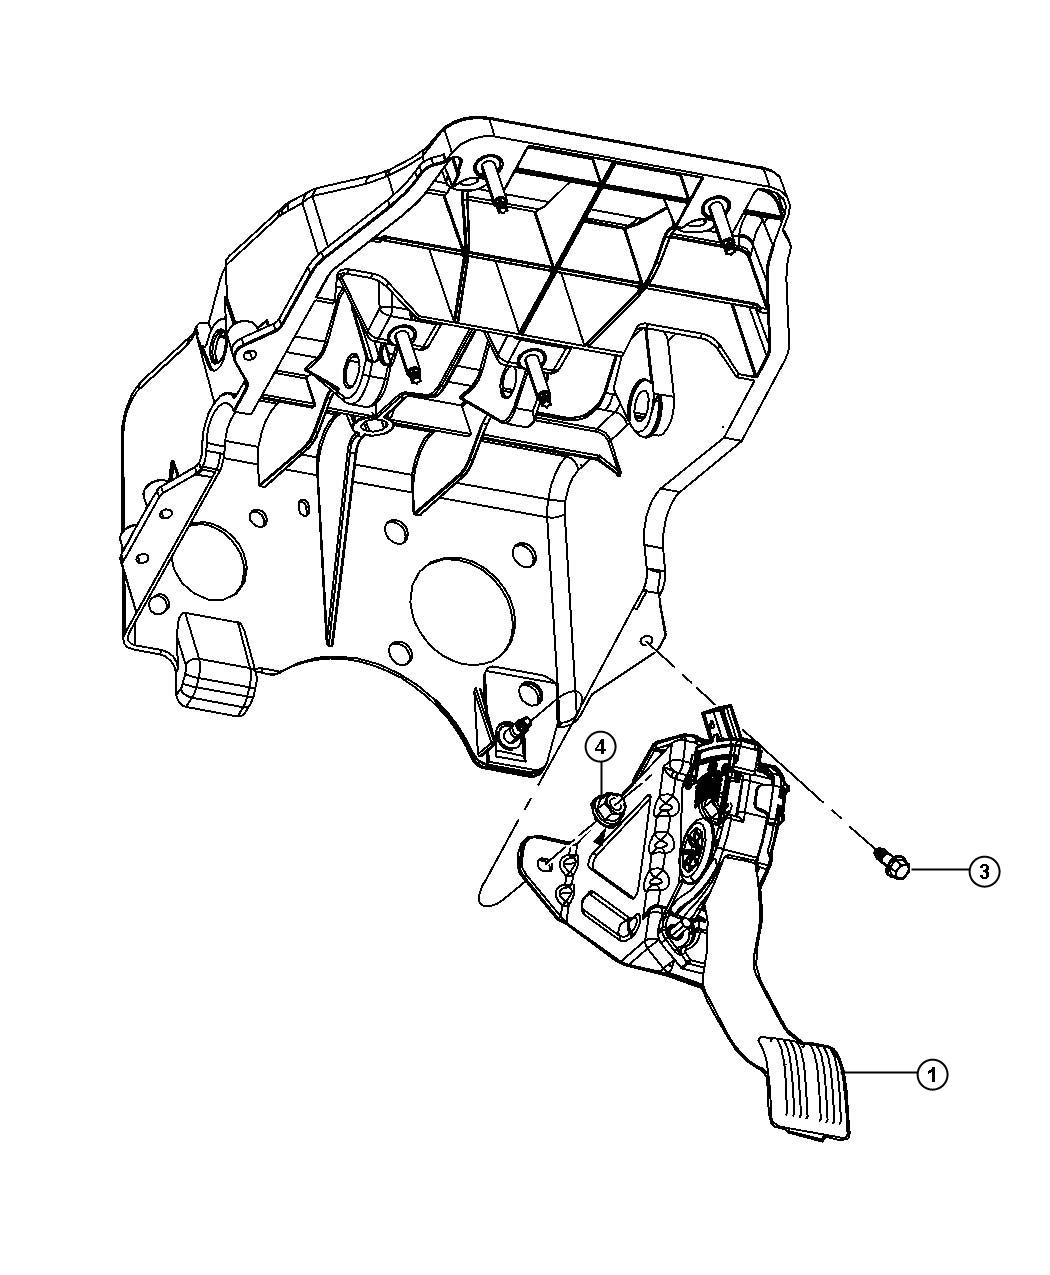 Dodge Ram Pedal Accelerator Non Adjustable